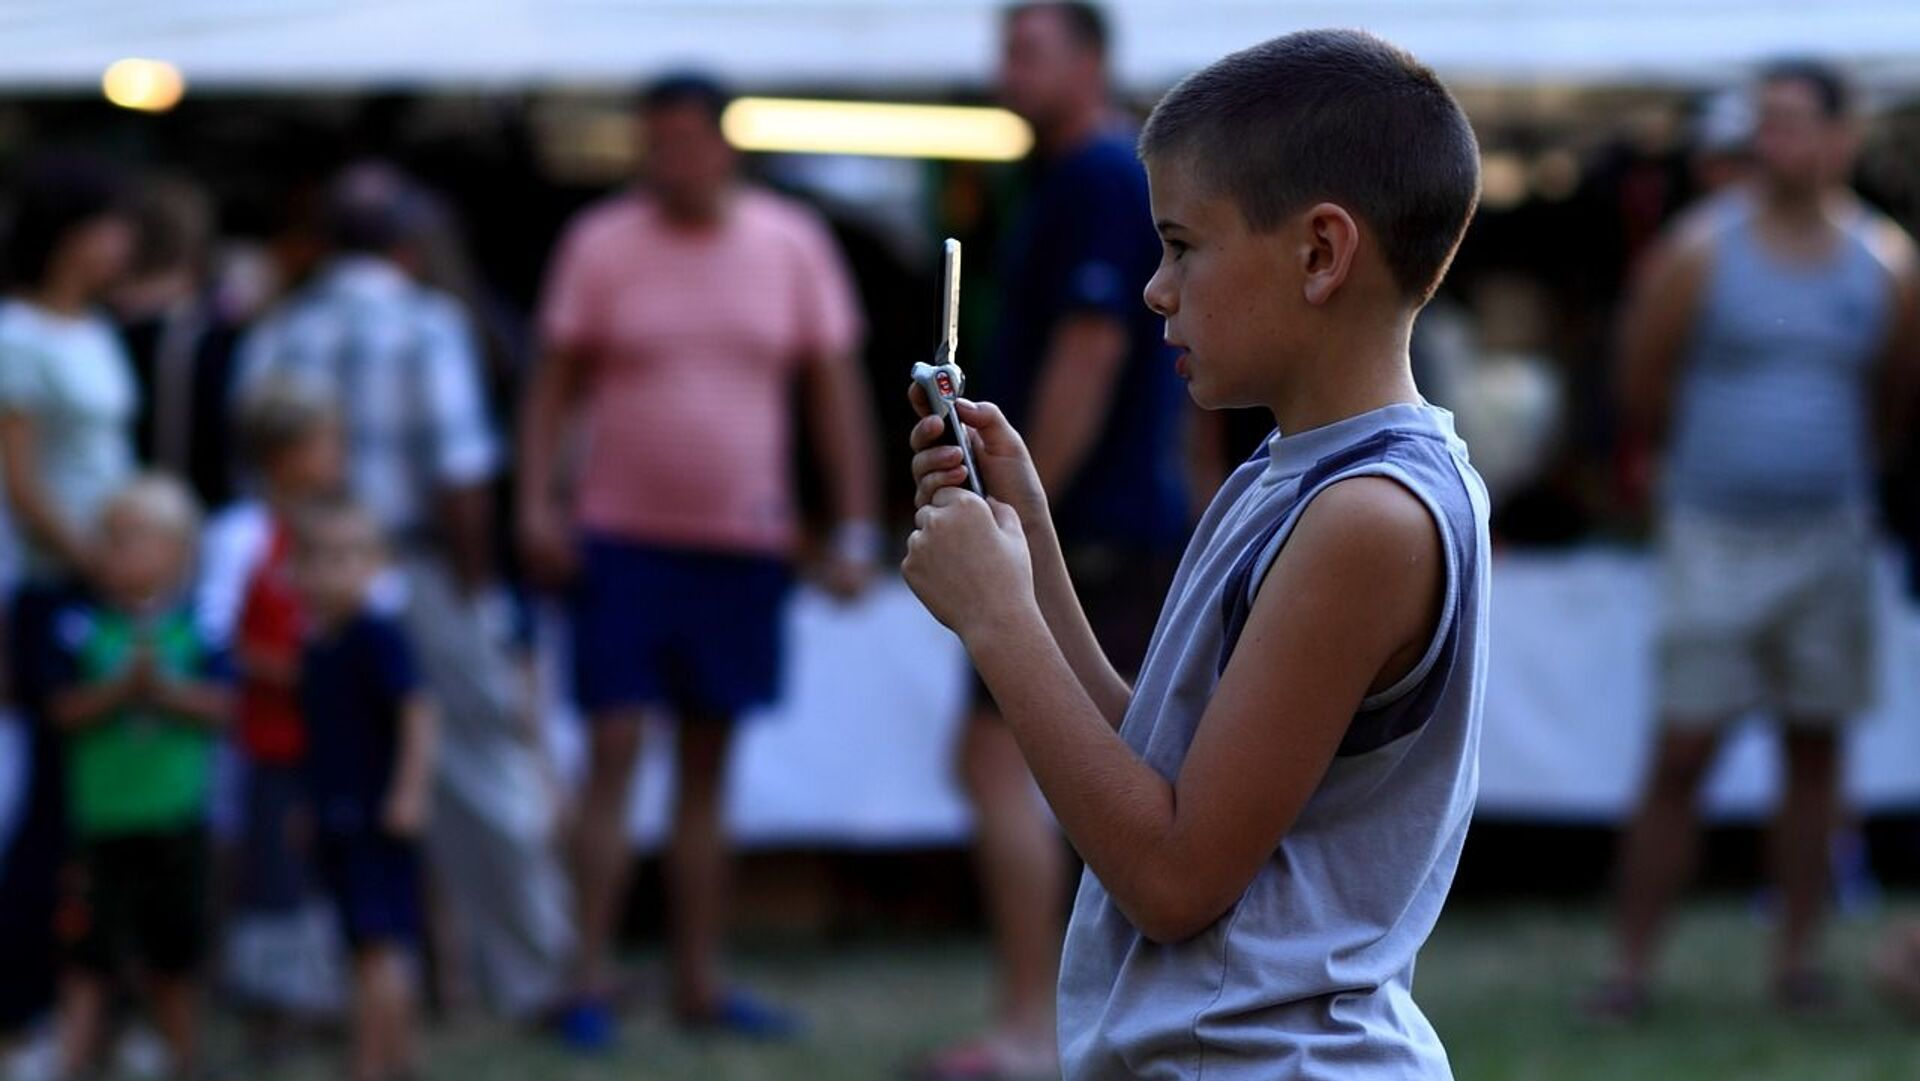 Дете и мобилни телефон - Sputnik Србија, 1920, 02.09.2021